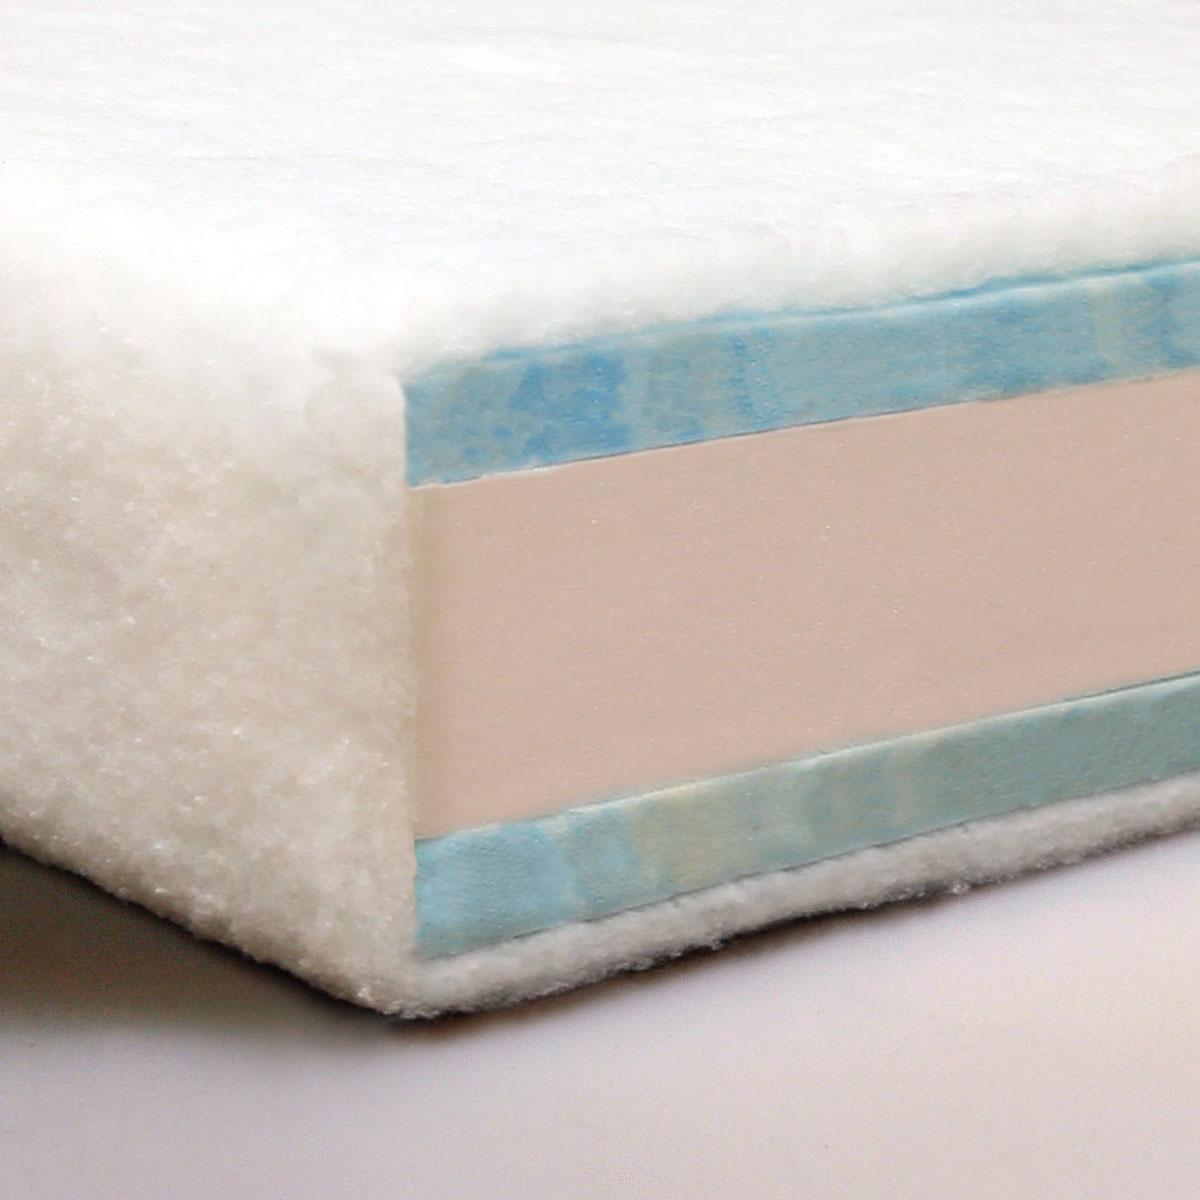 New! Optimal Comfort Fill with Memory Foam